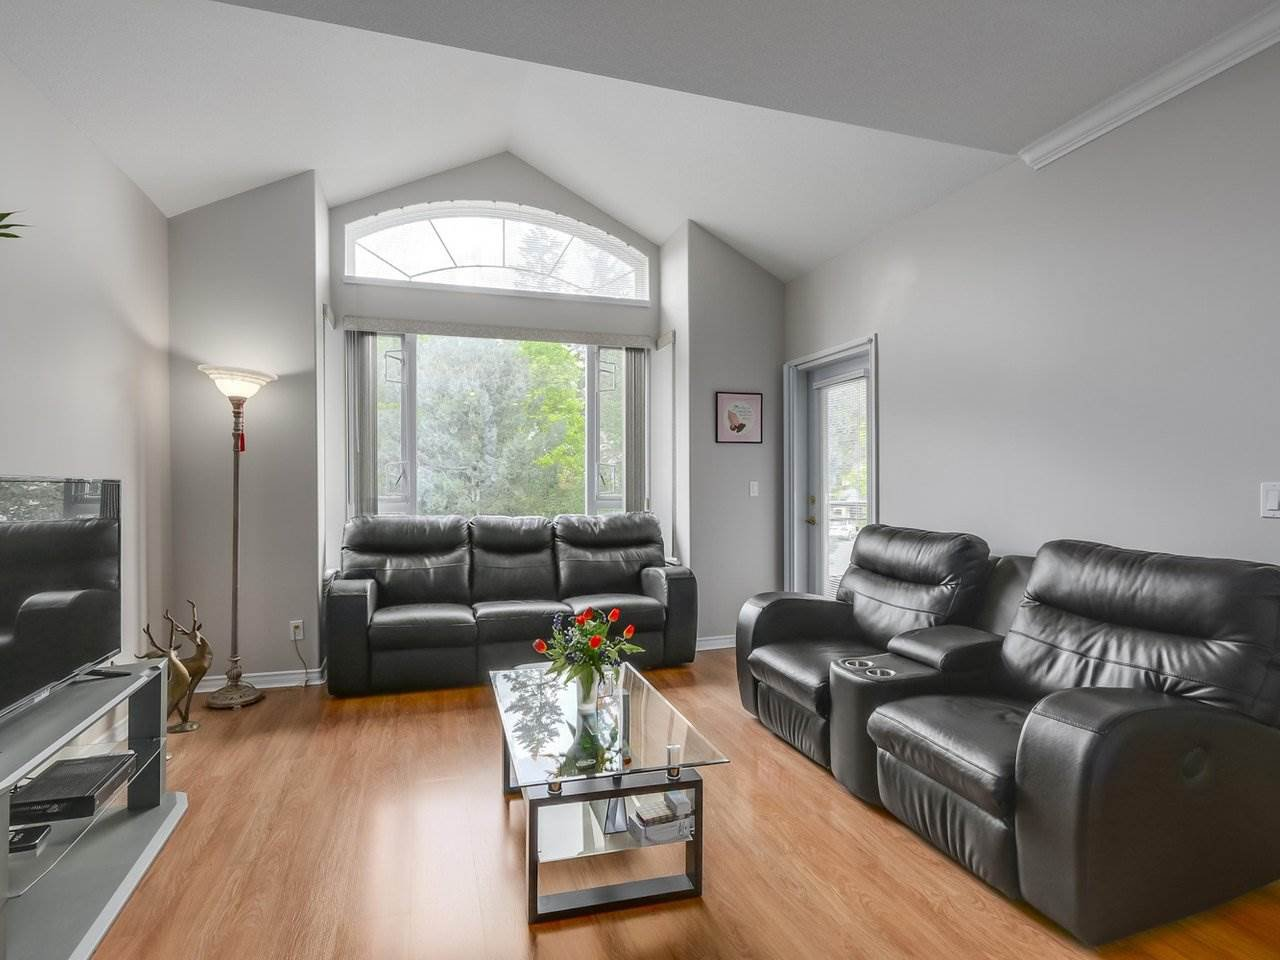 Photo 3: Photos: 303 3280 PLATEAU BOULEVARD in Coquitlam: Westwood Plateau Condo for sale : MLS®# R2275918